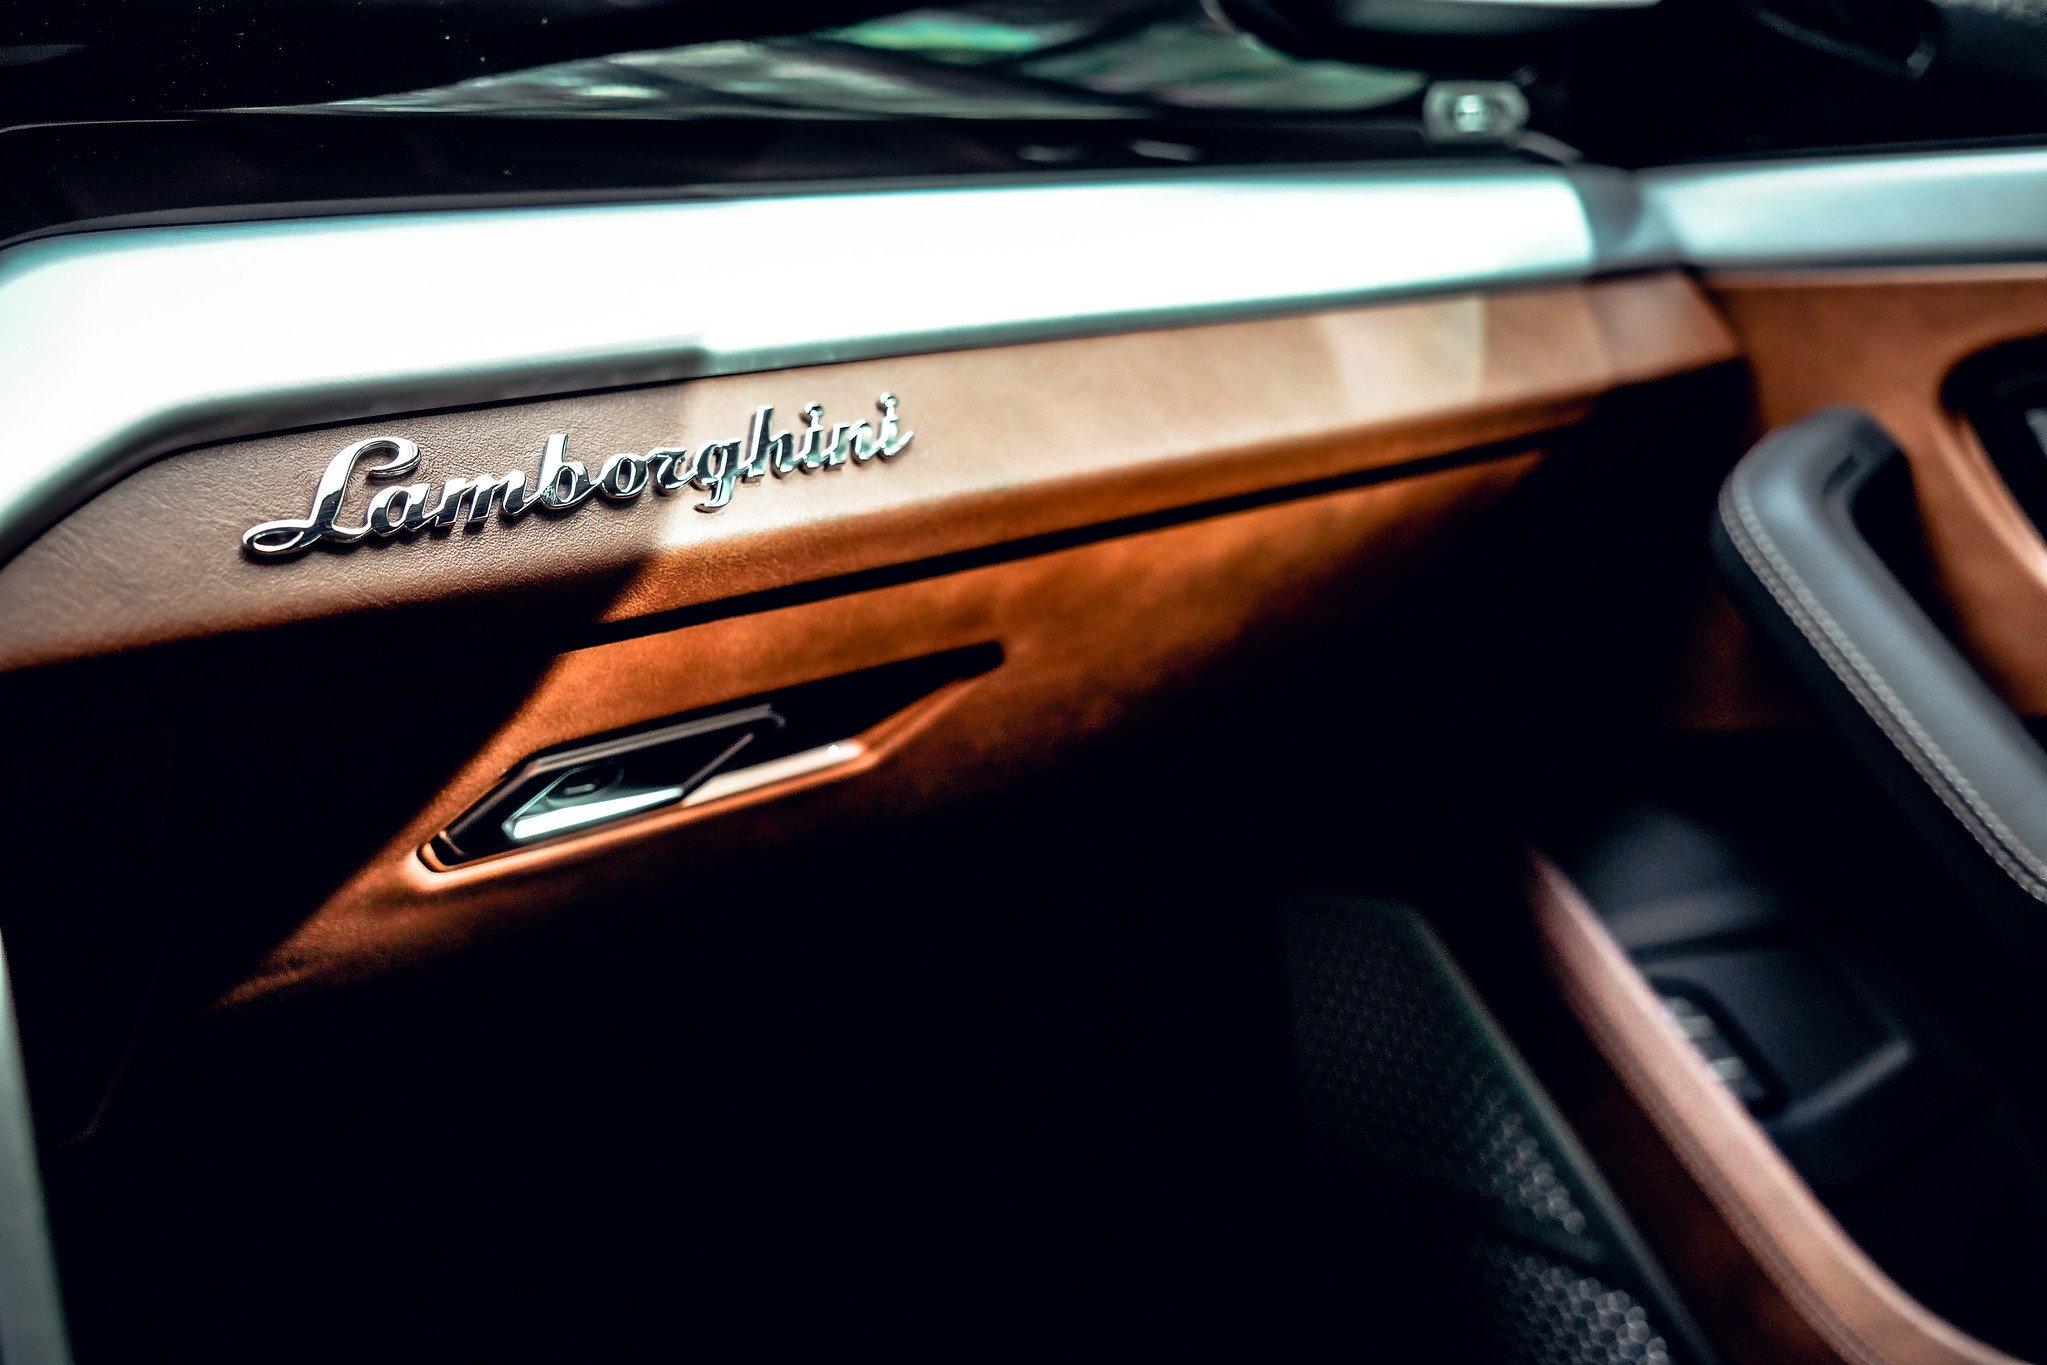 Image #18 of our  2021 Lamborghini Urus - Dark Blue    In Miami Fort Lauderdale Palm Beach South Florida